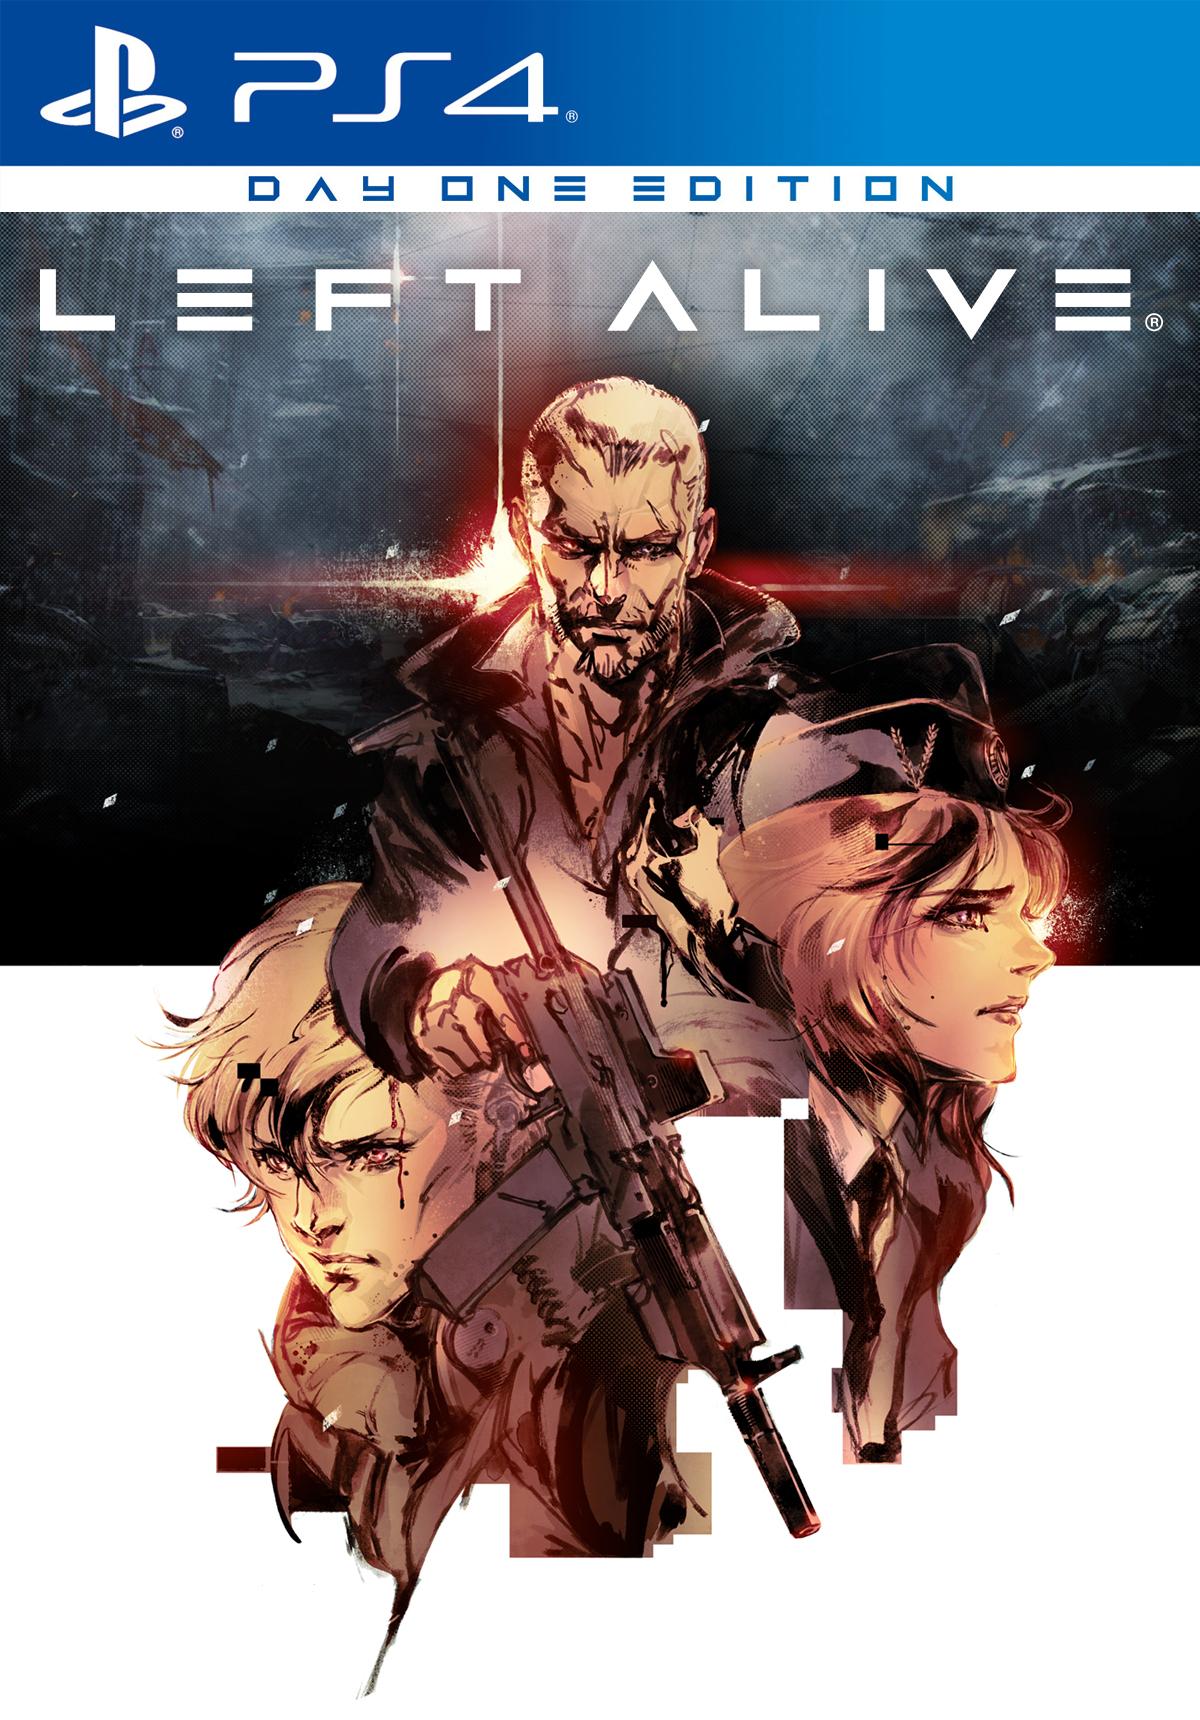 Left Alive Day One Edition (PS4/PC) + Clear File bonus @ SquareEnix Store